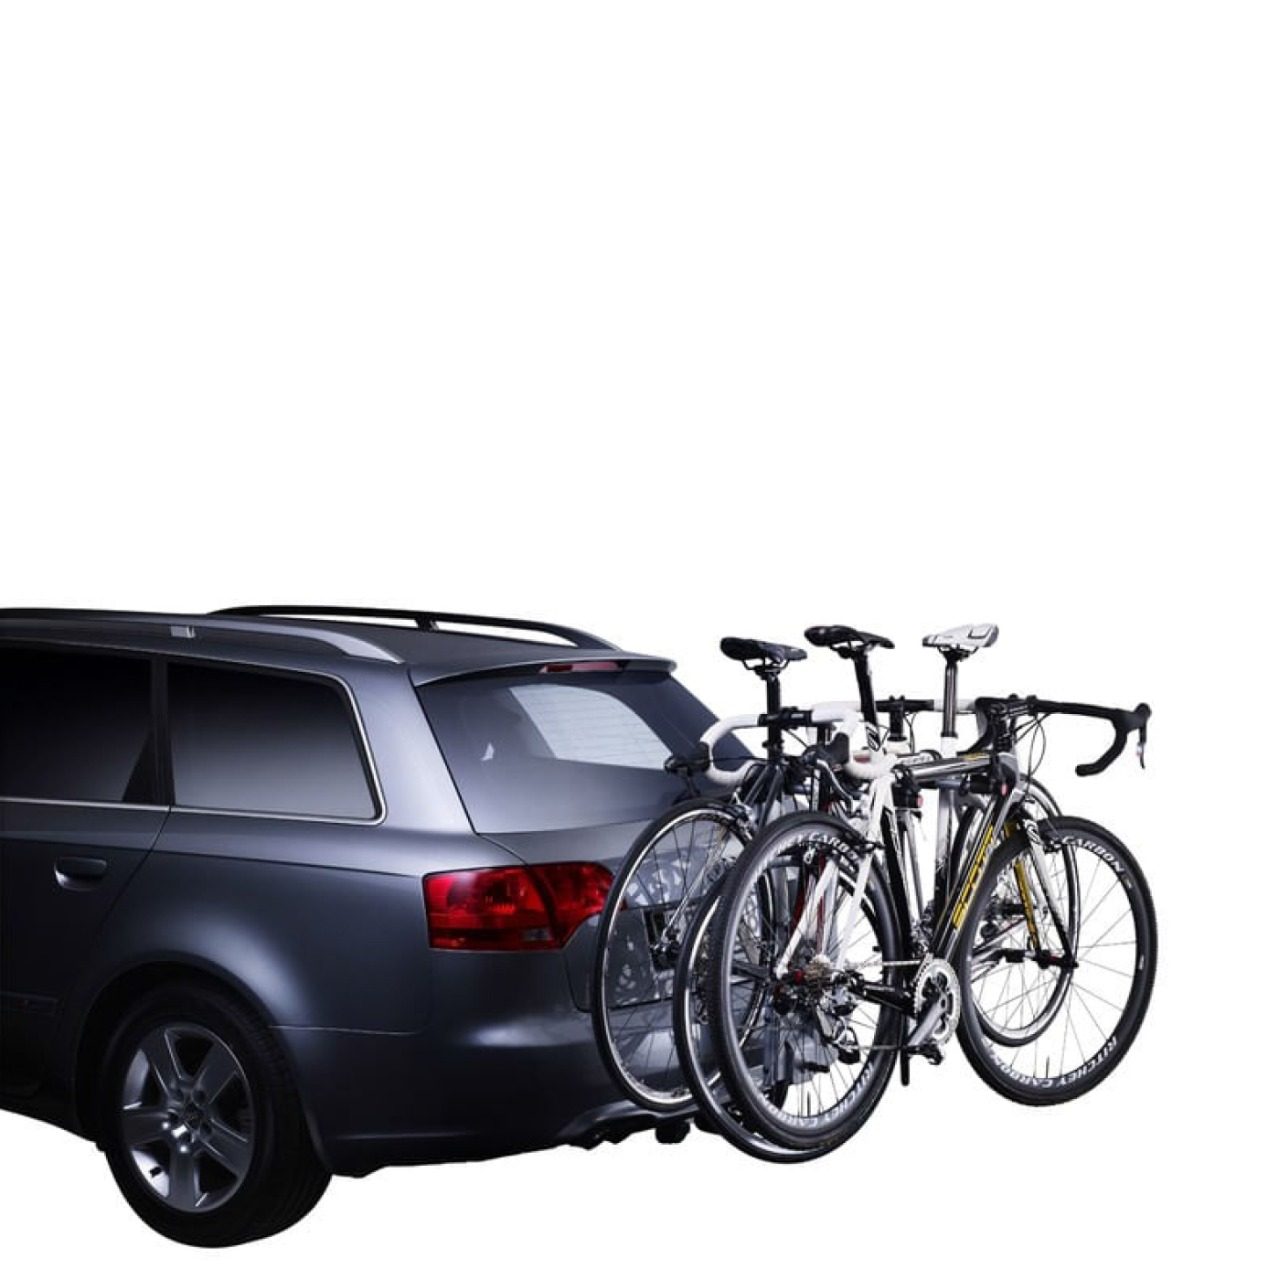 Transbike Suporte de engate para 3 Bicicletas Thule HangOn 974